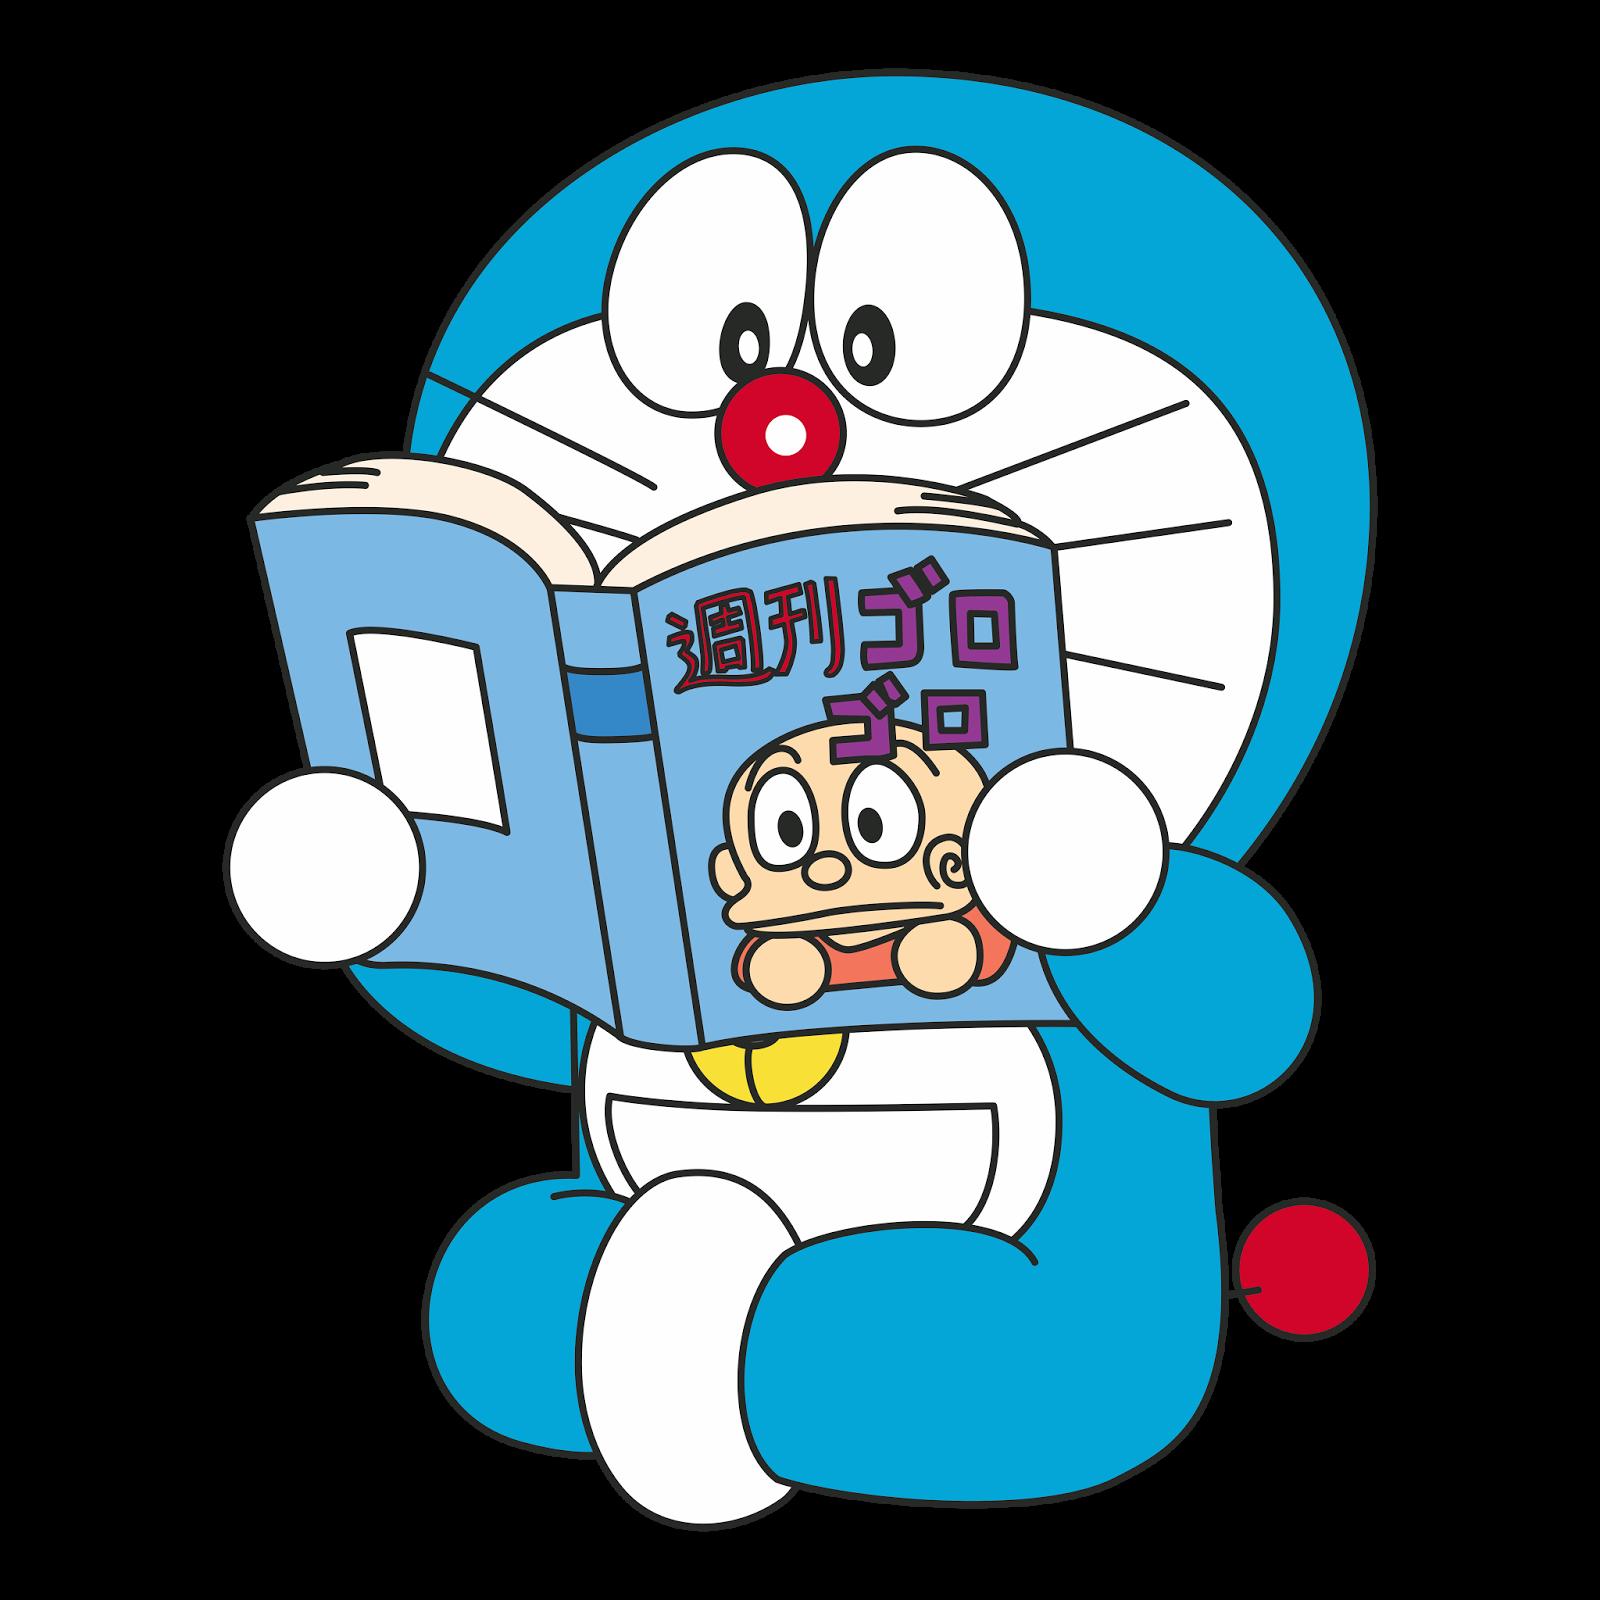 Kumpulan Vector Doraemon Keren Dan Lucu File CDR CorelDraw Download